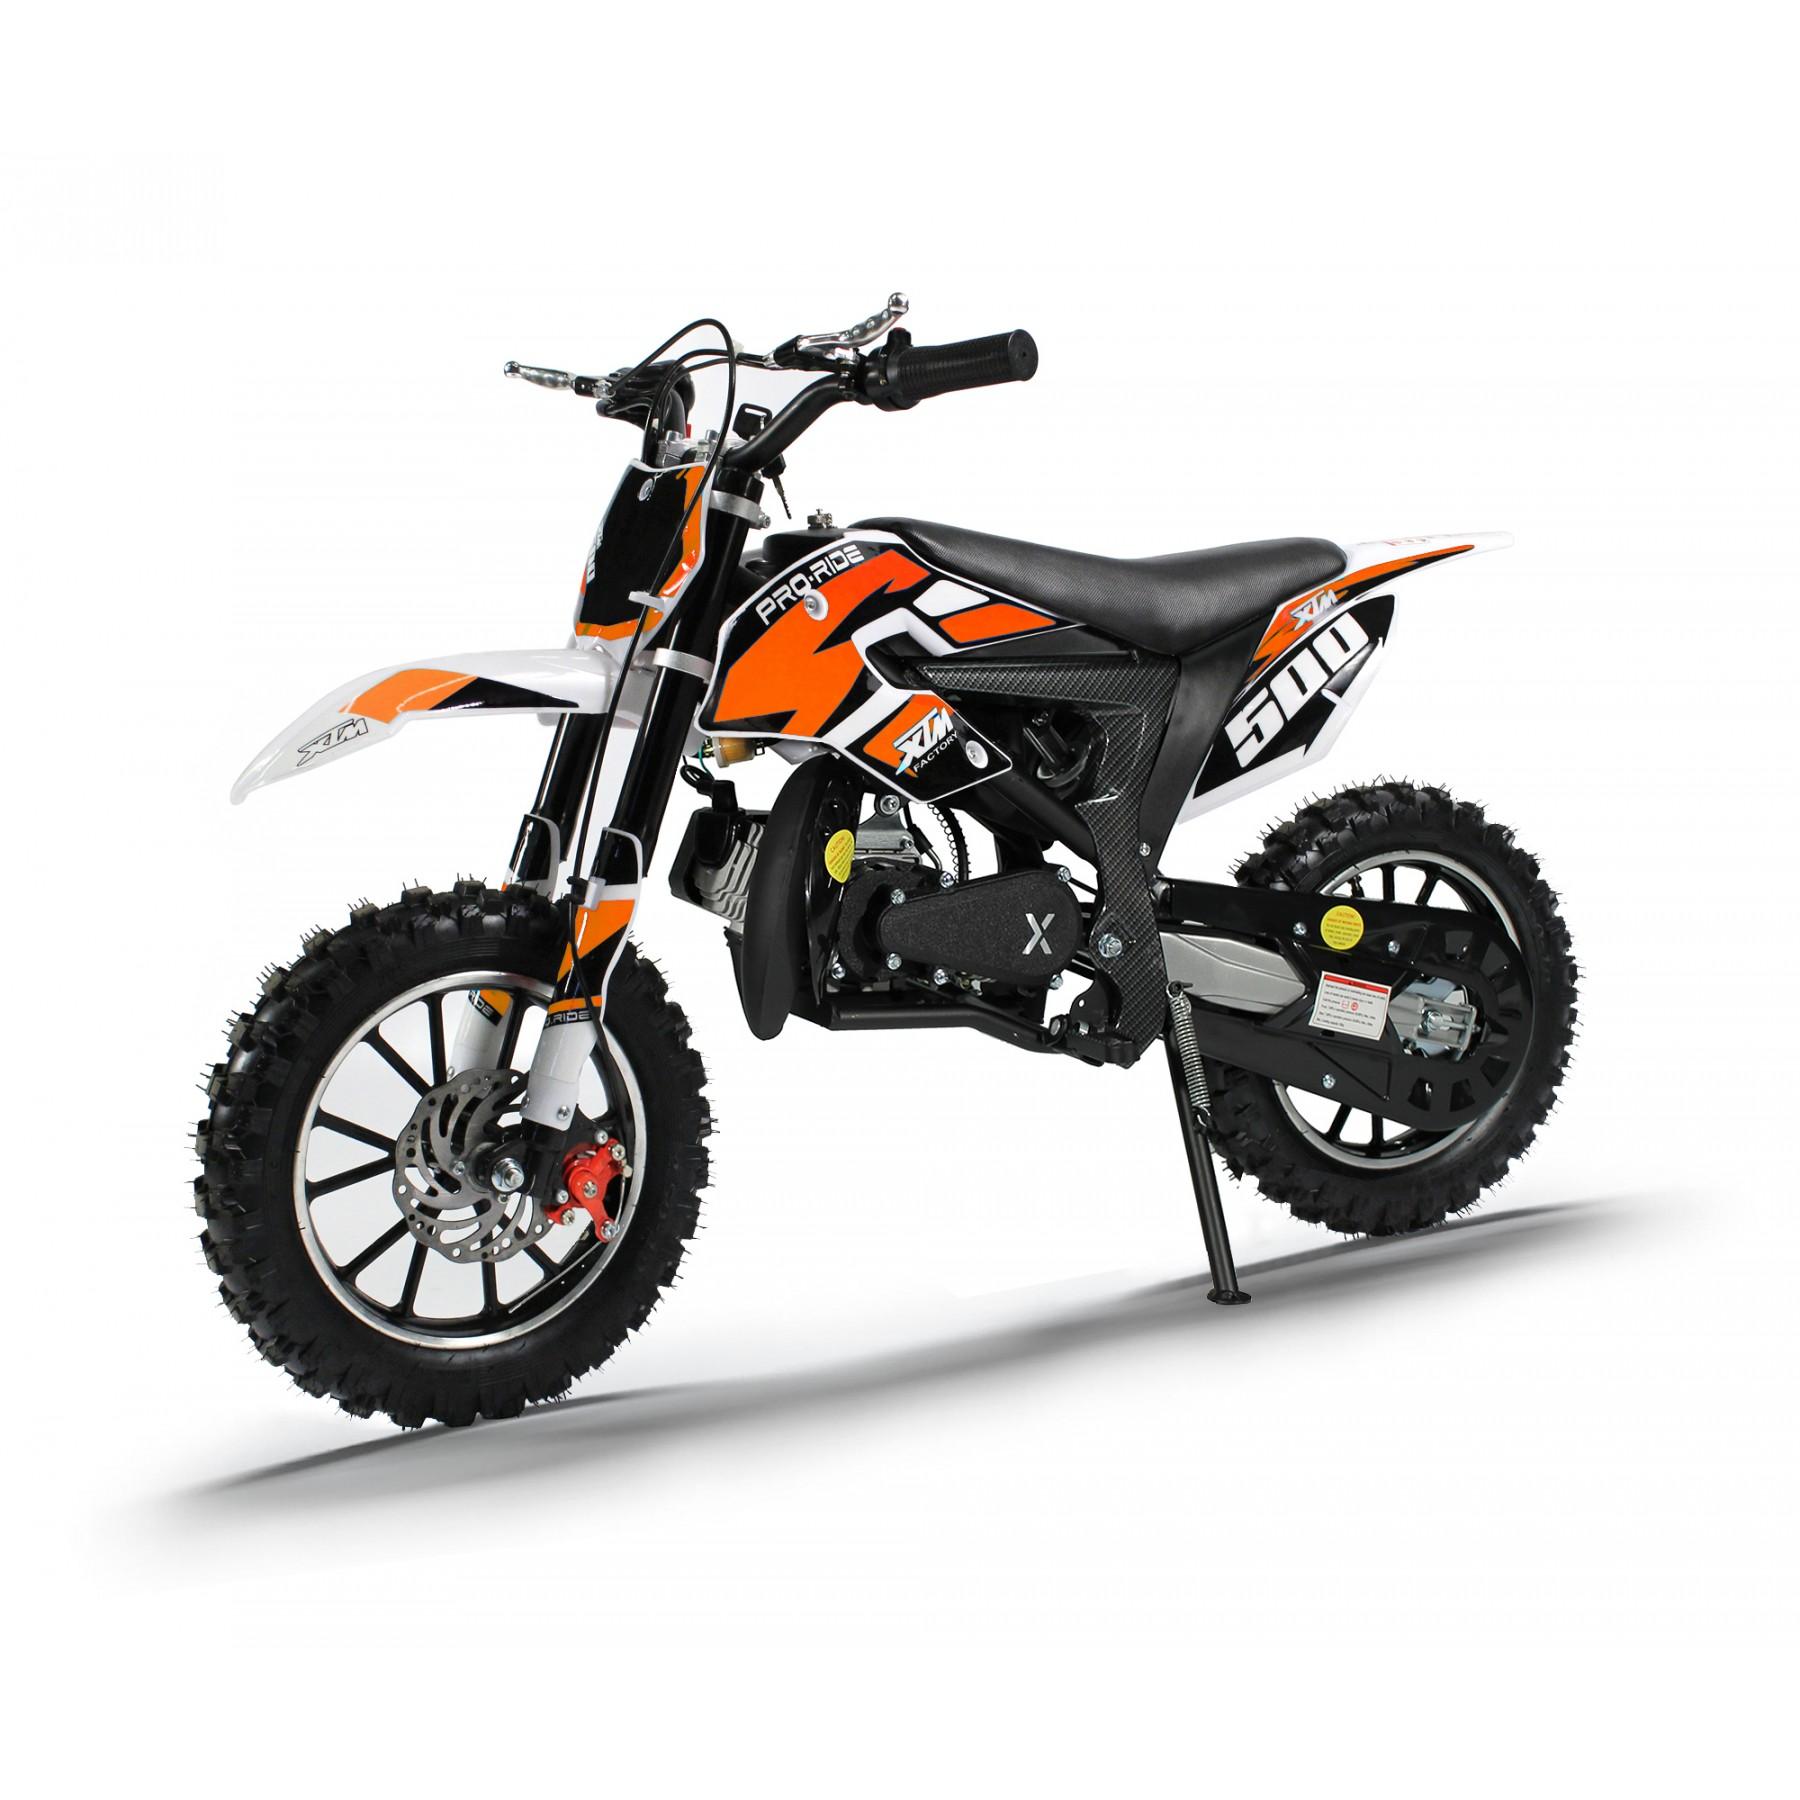 XTM PRO-RIDER 50cc DIRT BIKE ORANGE